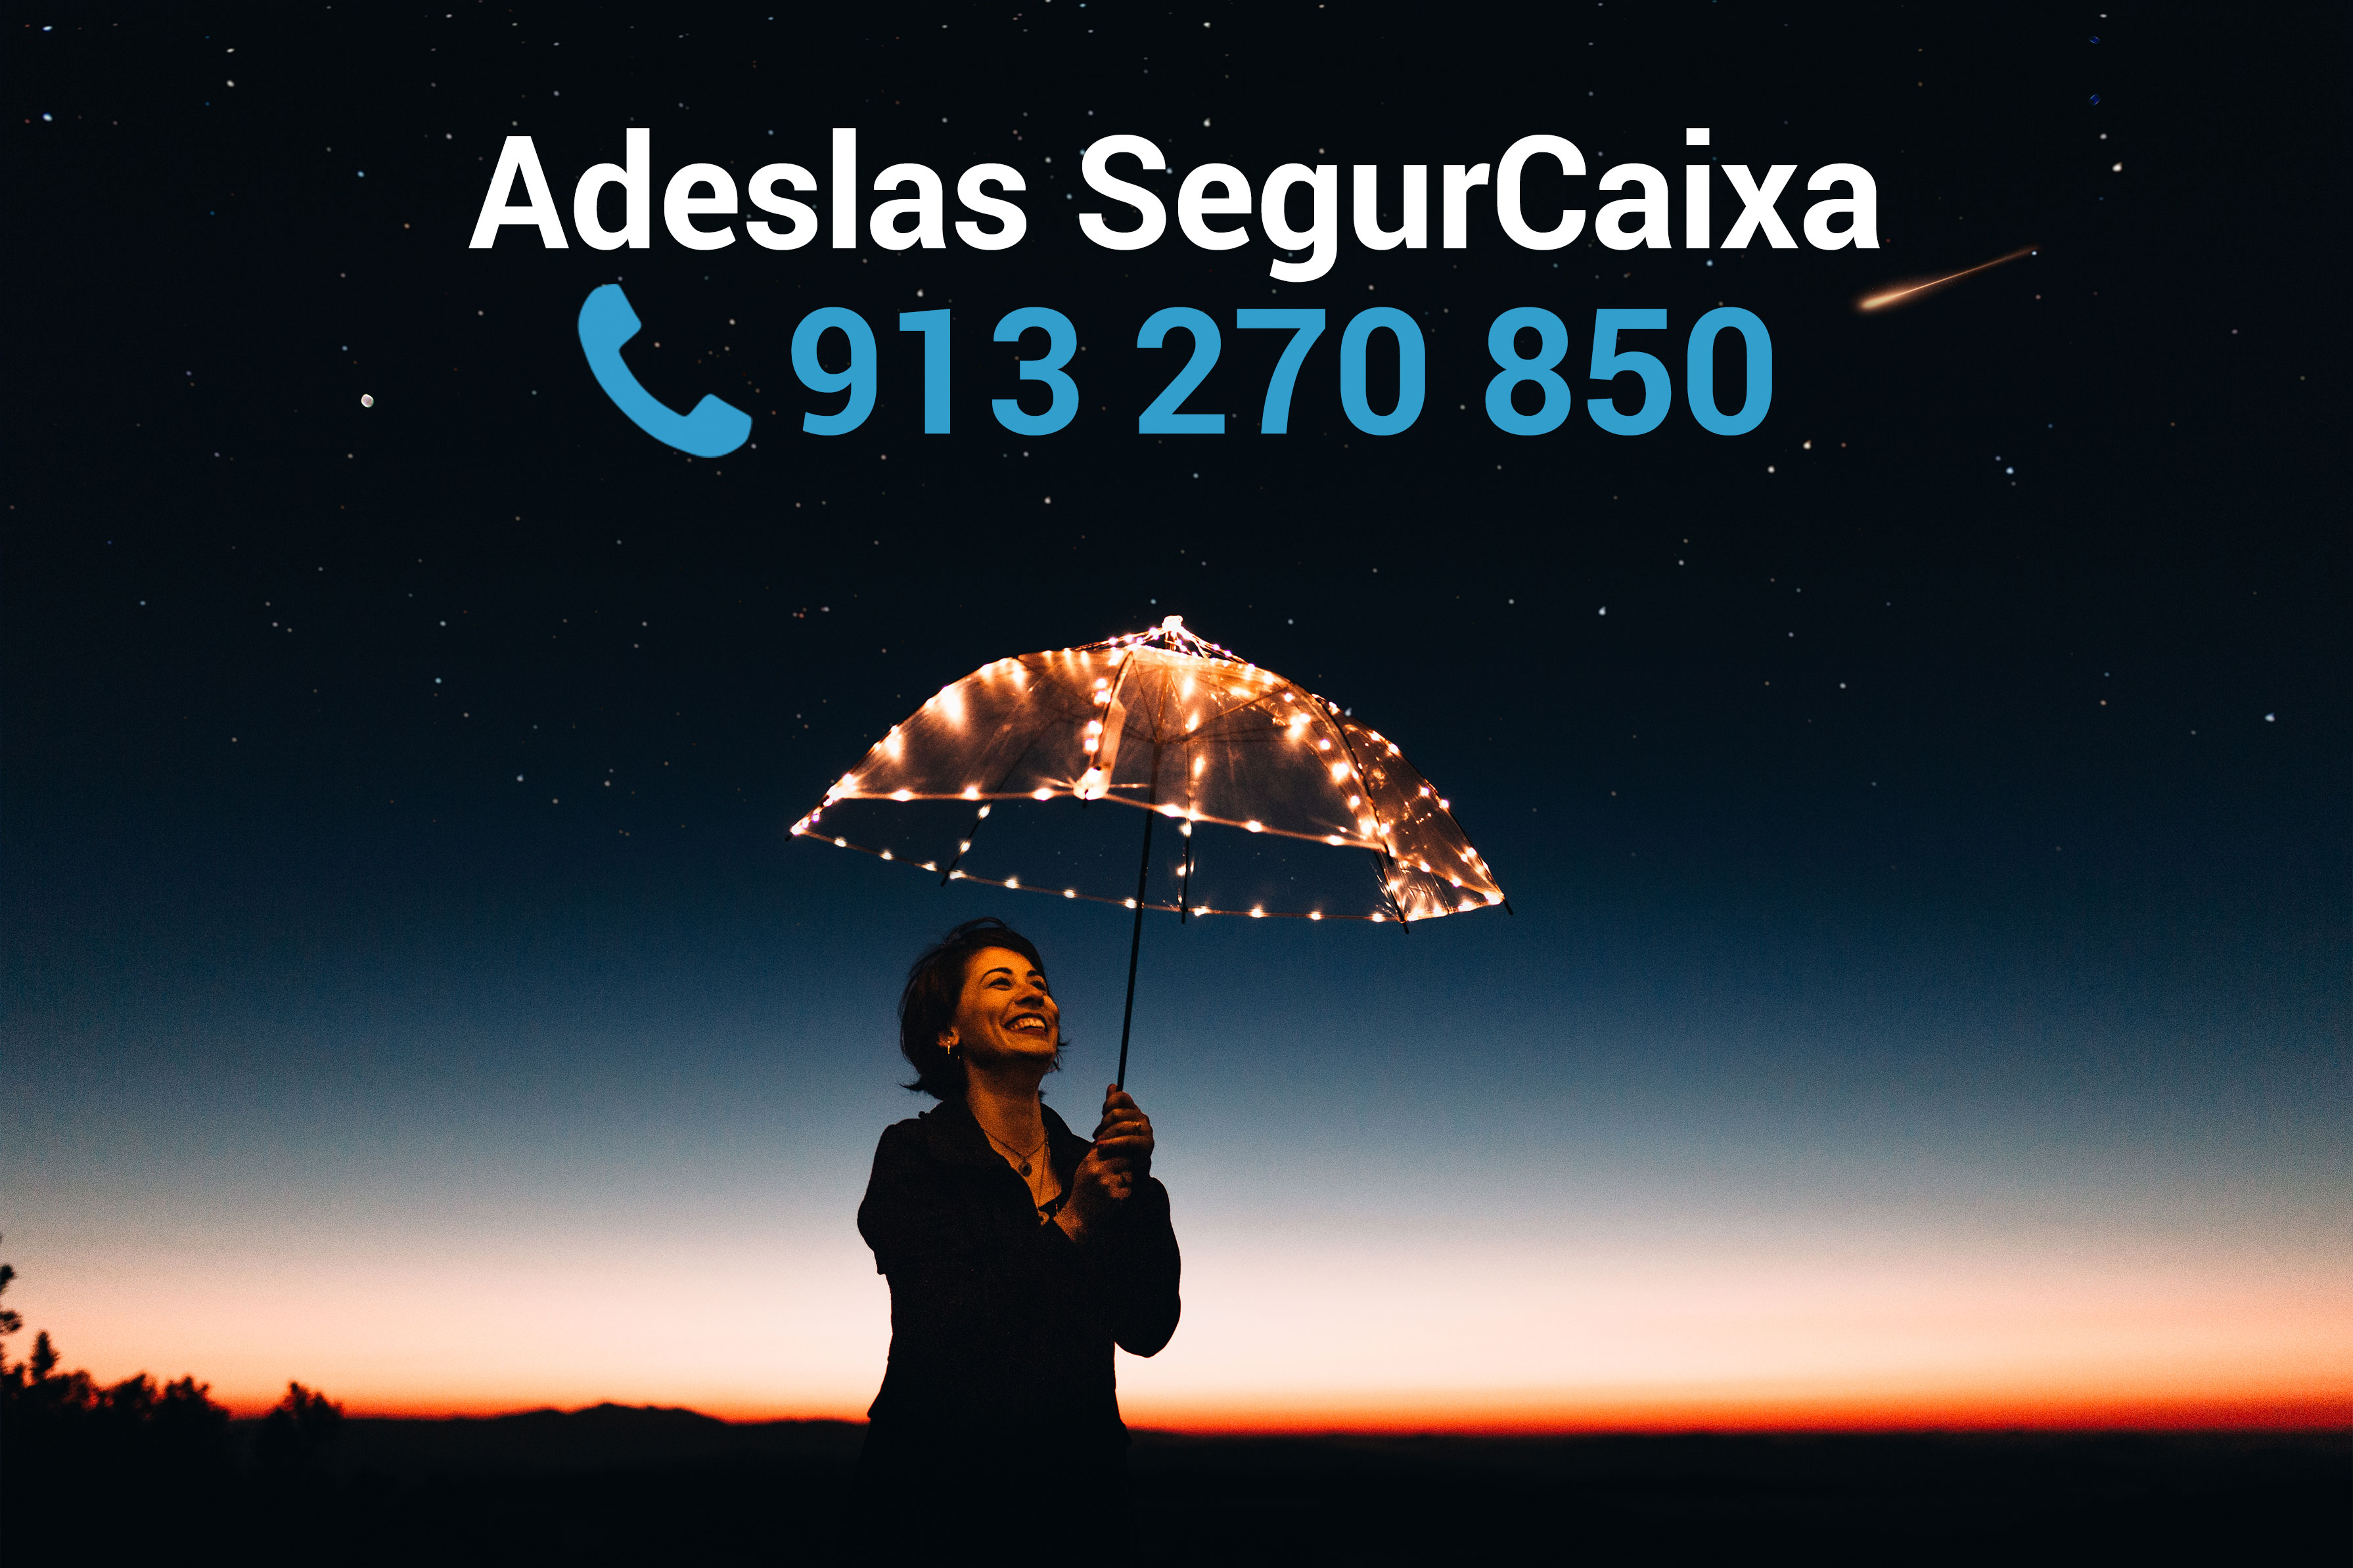 Adeslas Segurcaixa Seguros Adeslas Telf 913 270 850